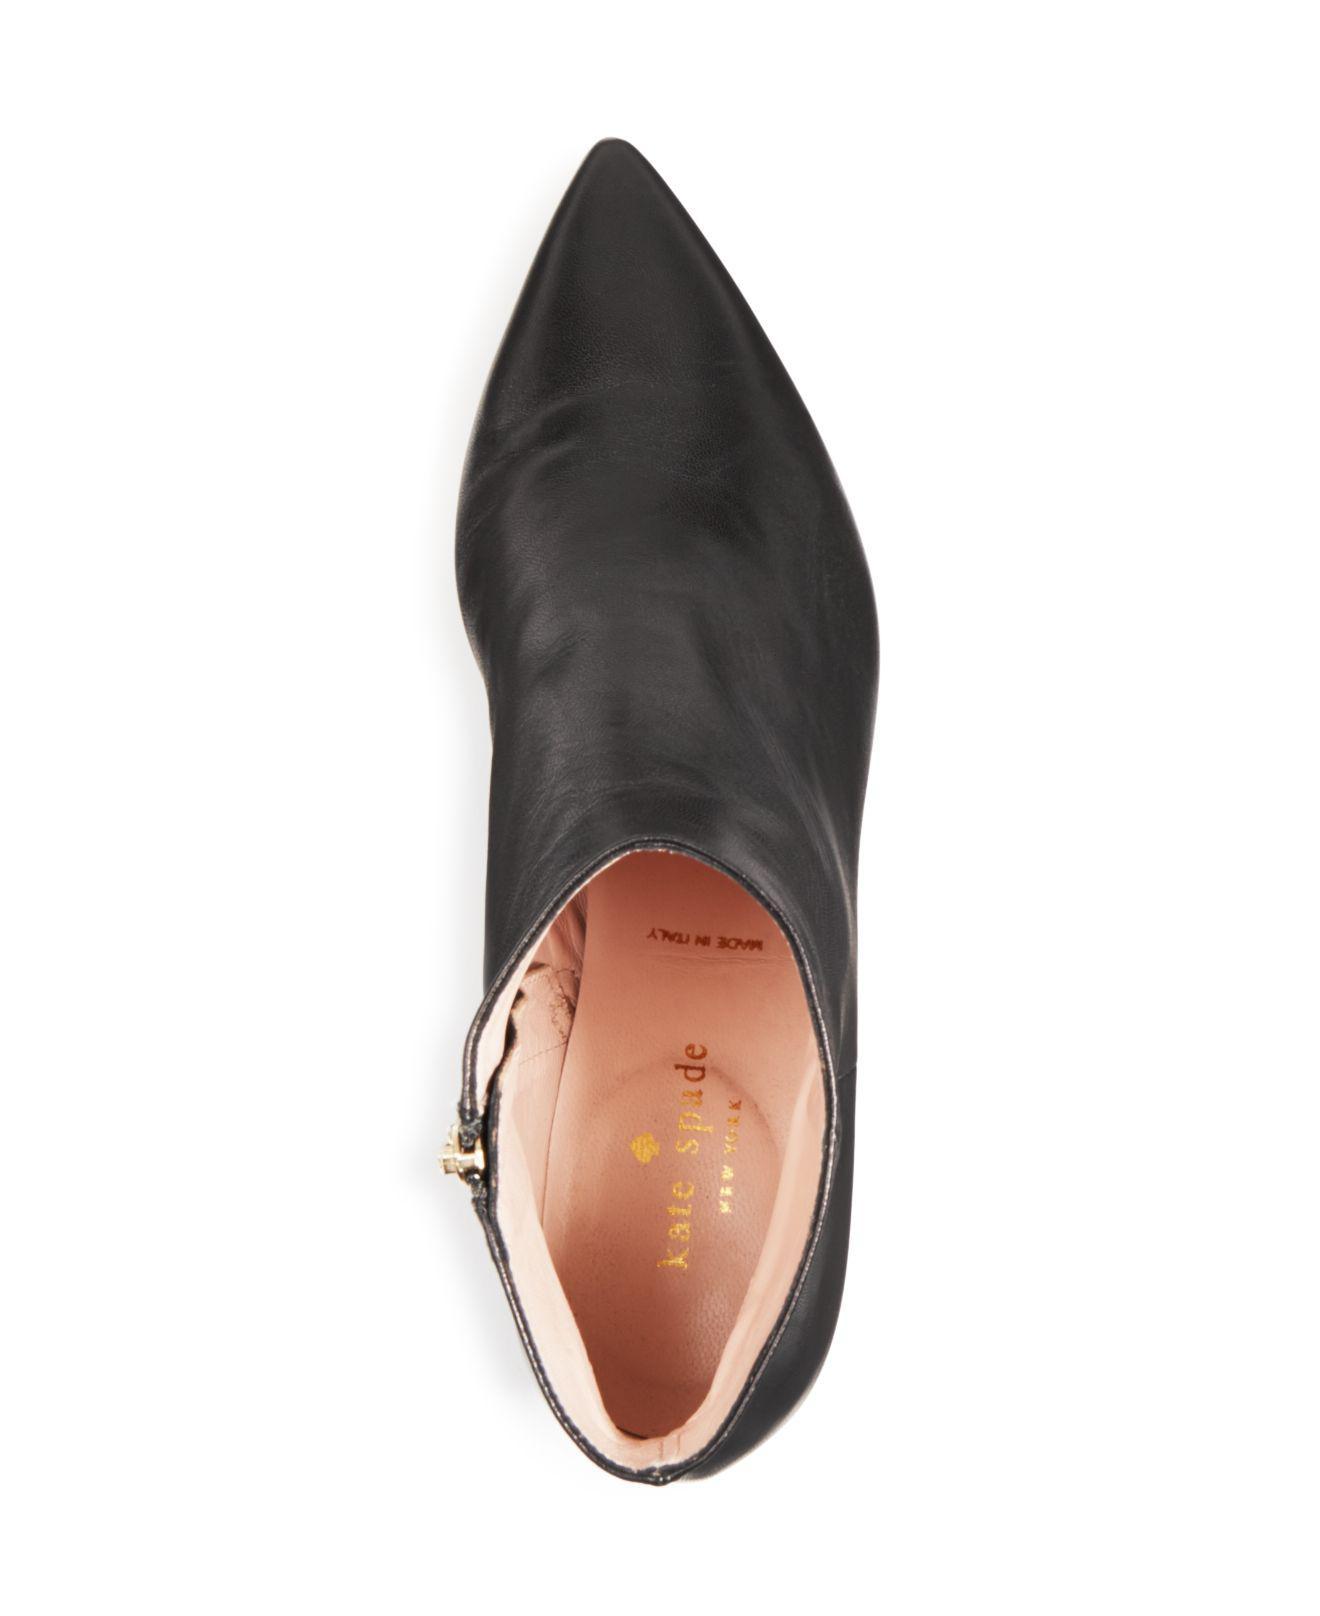 9abaf42fee1b Lyst - Kate Spade Women s Olly Leather Booties in Black